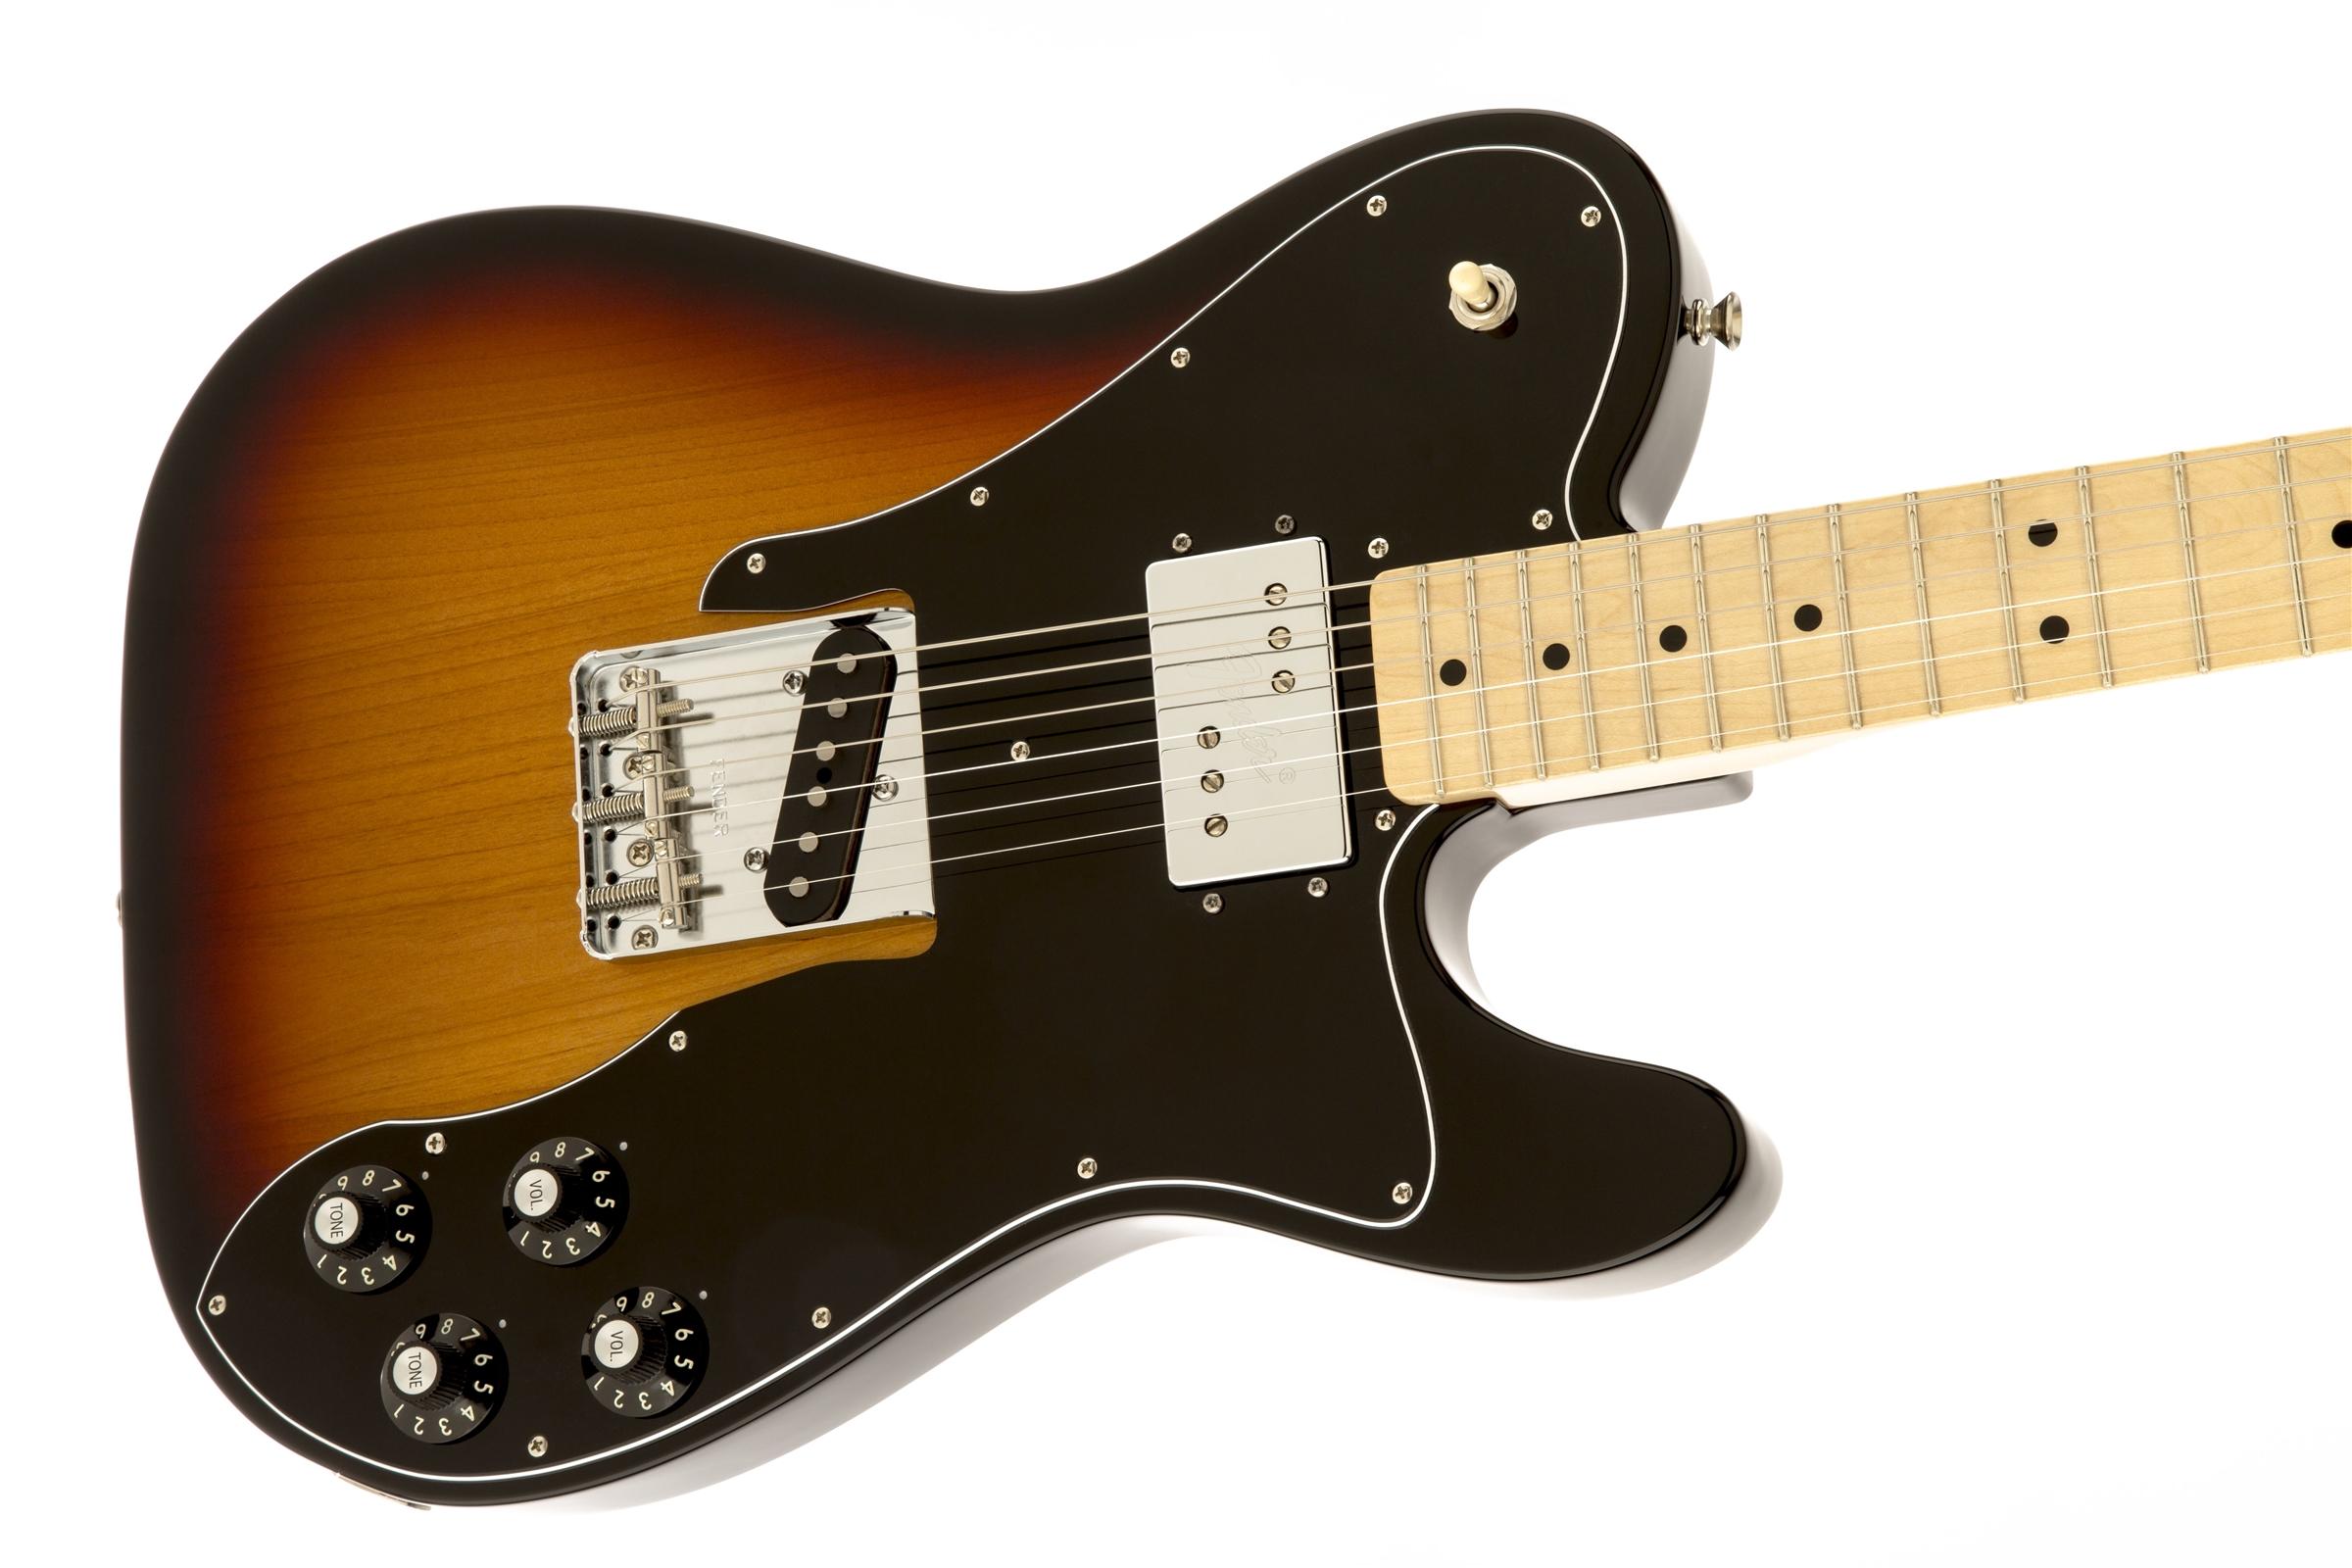 Fender Standard Stratocaster Wiring Best Secret Diagram Guitar Hss Strat Lace Sensor American Shawbucker